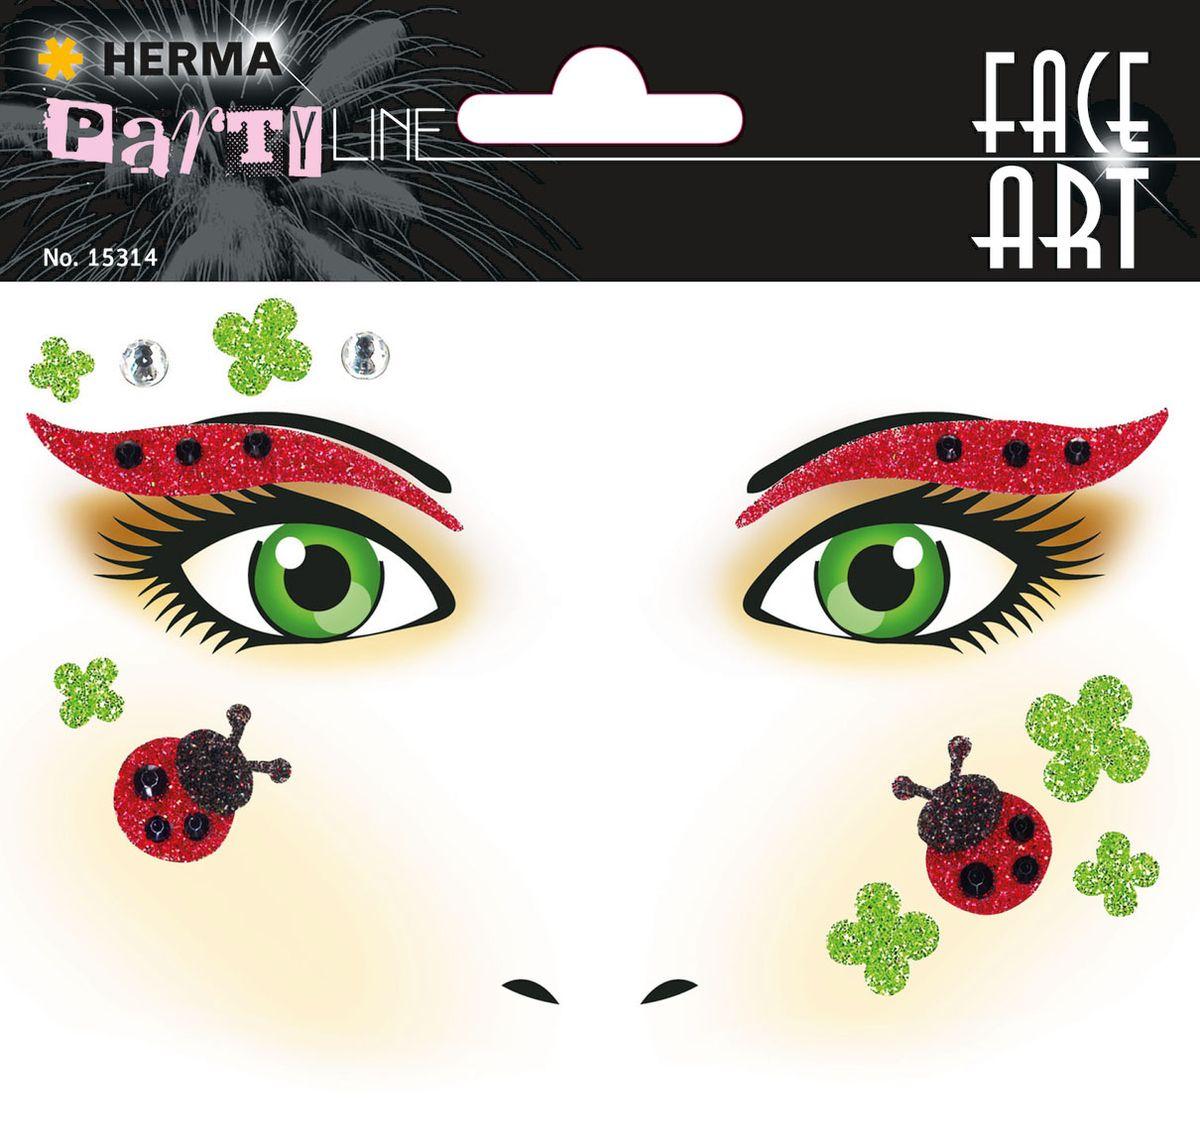 Herma Наклейки на лицо Face Art Glueckskaefer (Божья коровка)